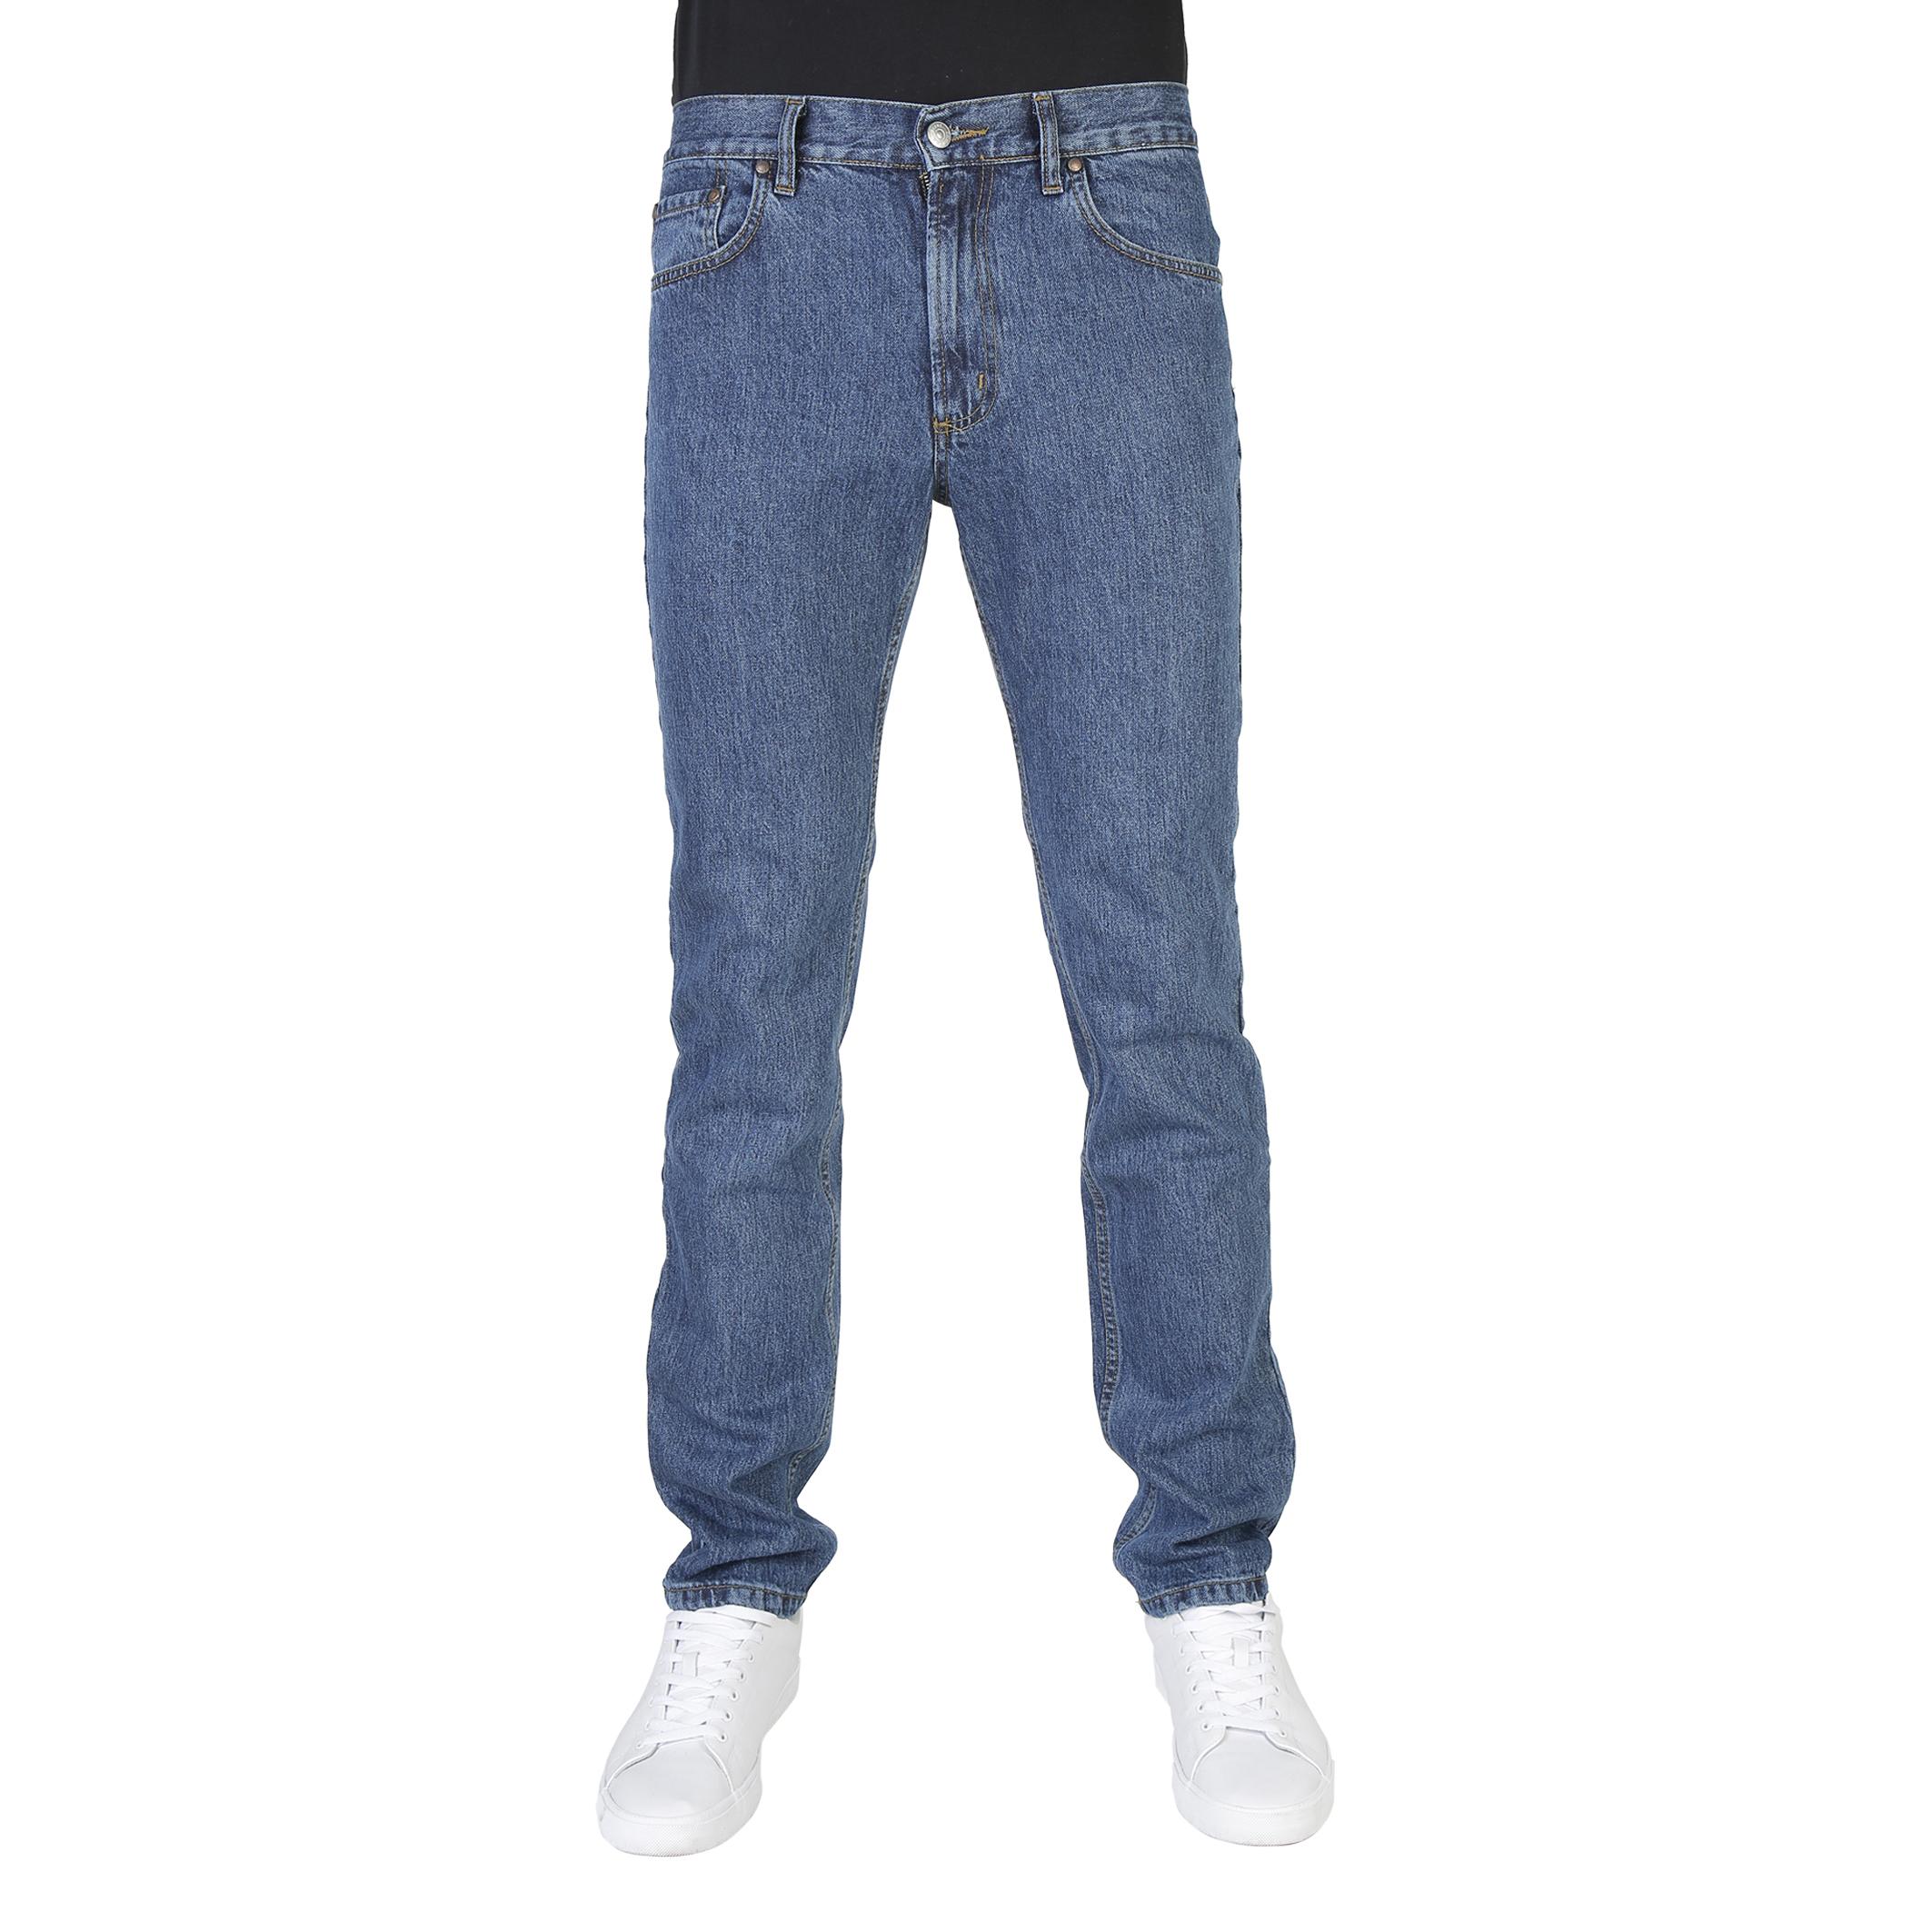 Jeans Carrera Jeans 000700_01021 Uomo Blu 76355